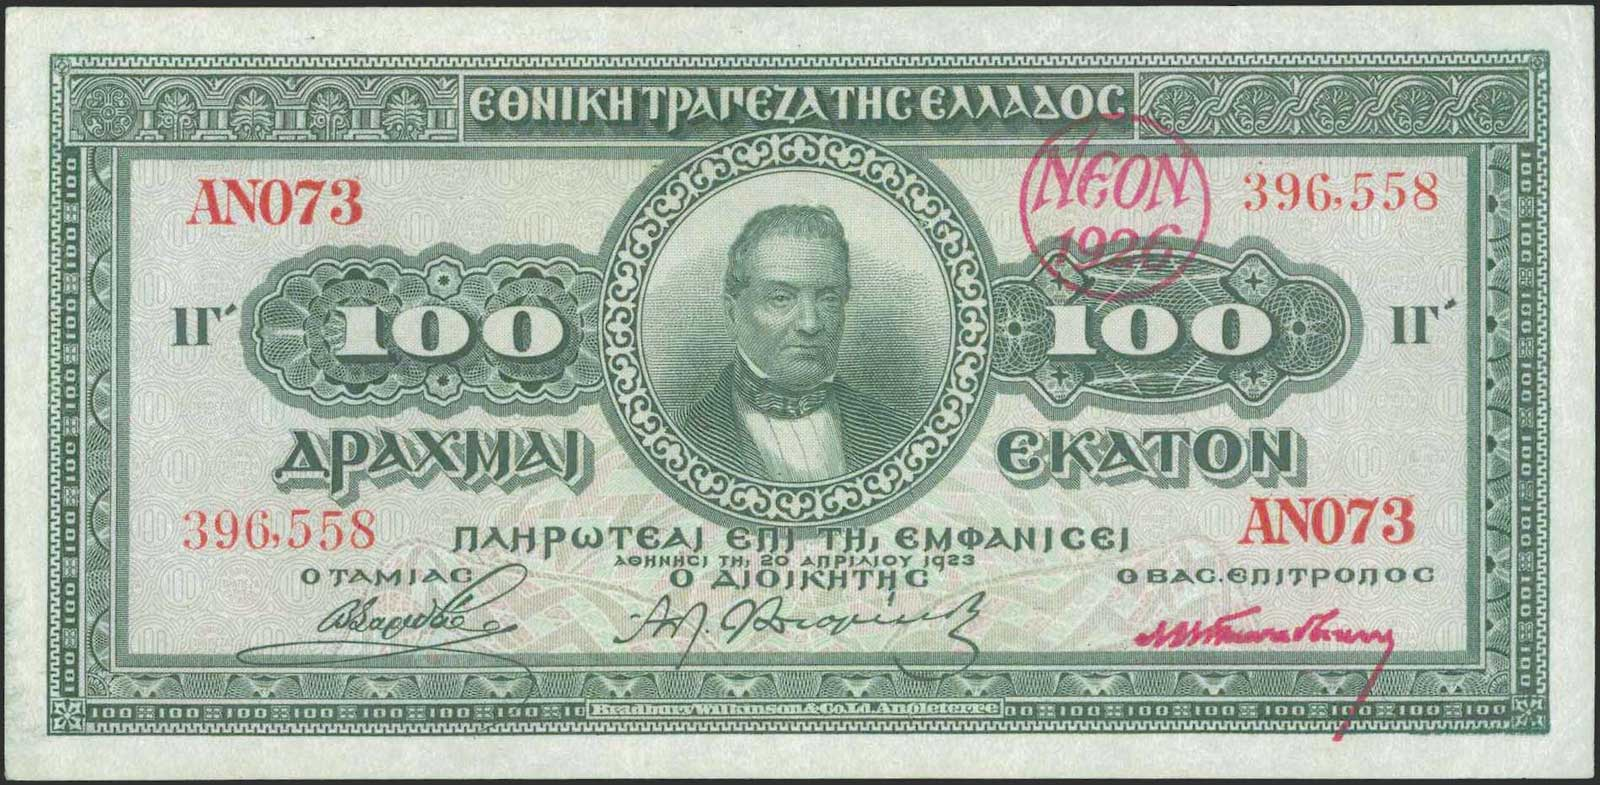 Lot 9276 - GREECE-  PAPER MONEY - BANKNOTES National Bank of Greece -  A. Karamitsos Public & LIVE Bid Auction 610 Coins, Medals & Banknotes